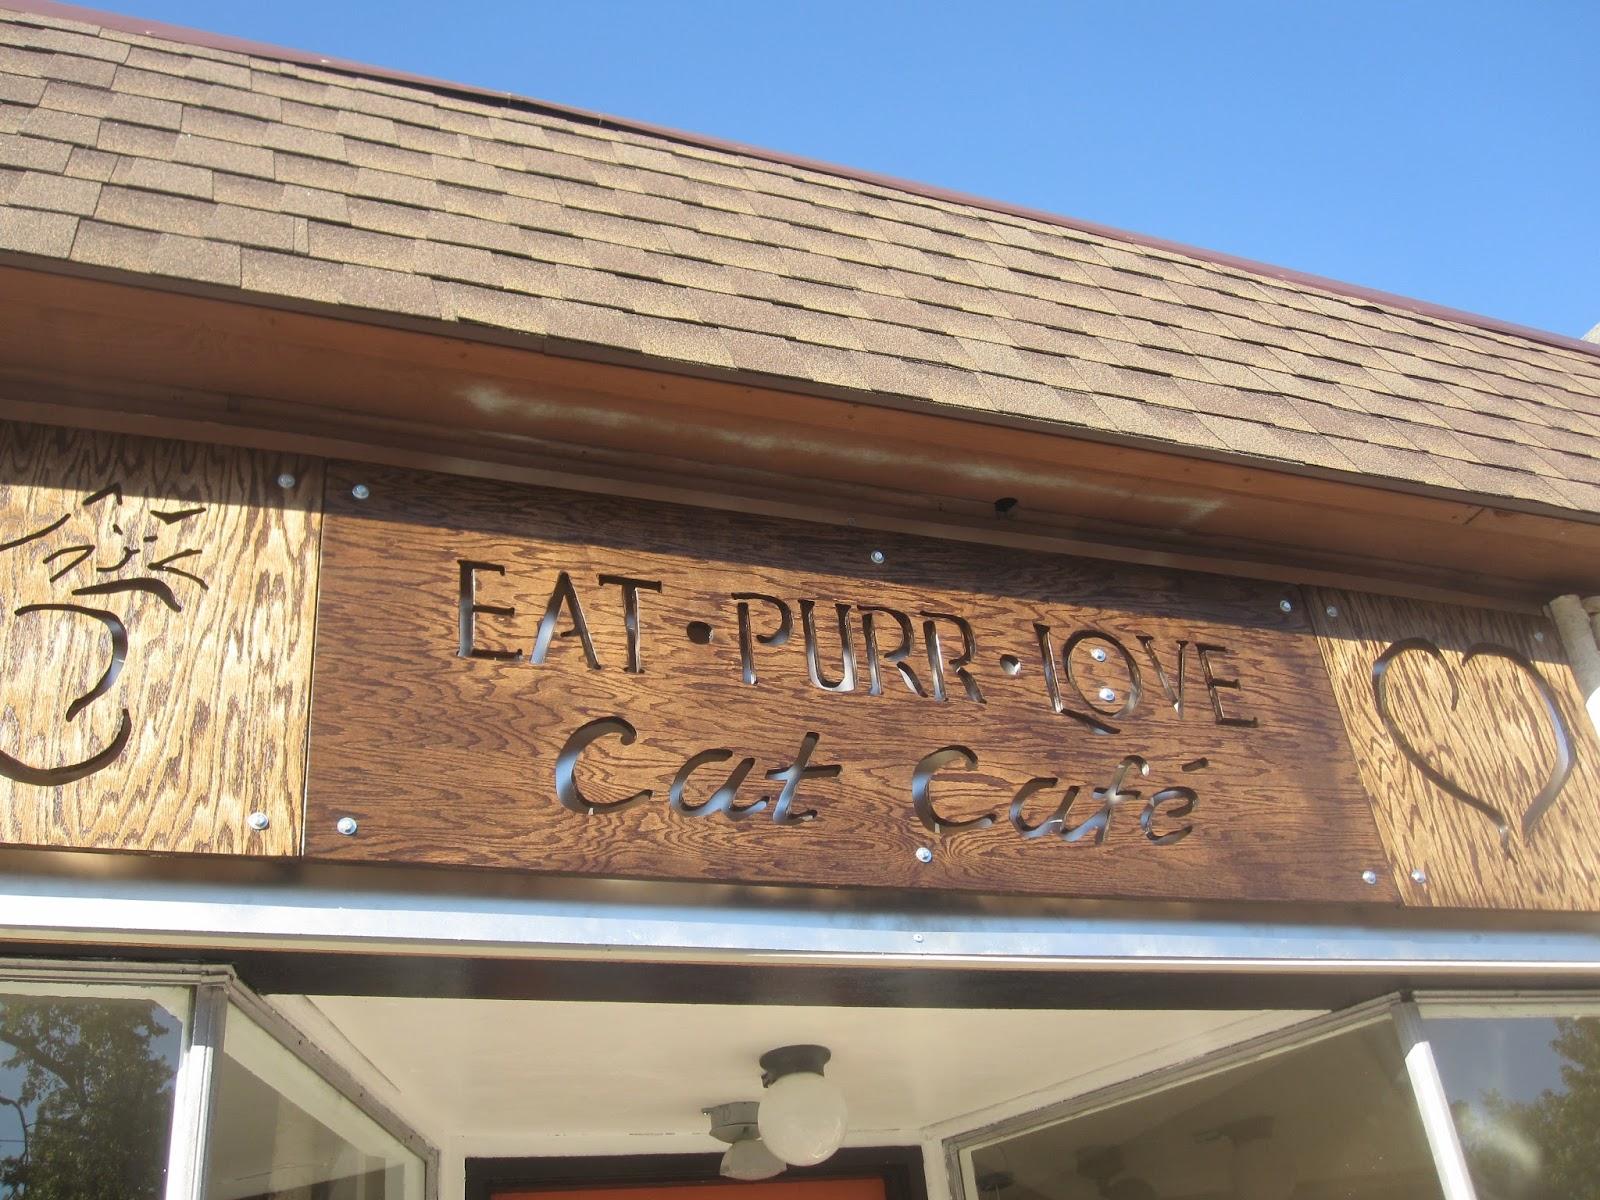 Eat Purr Love Cat Cafe Columbus Oh